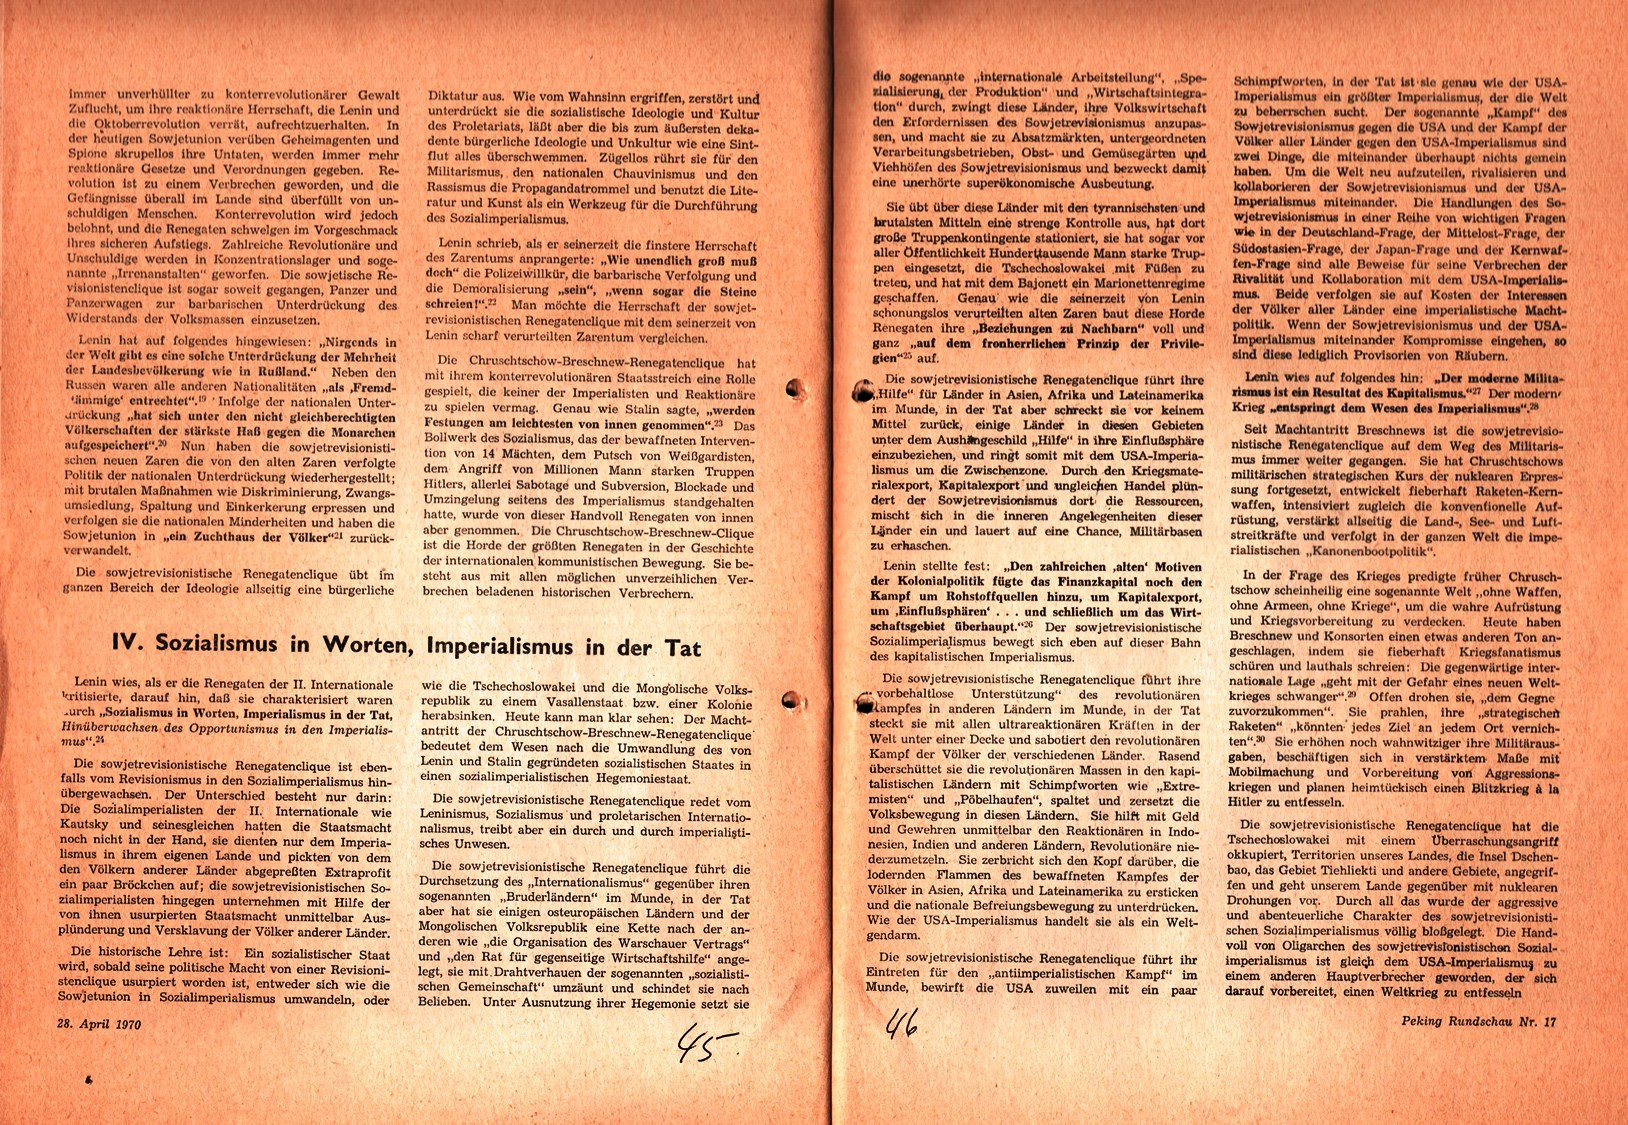 KSV_1974_Materialien_zur_Programmdiskussion_01_024